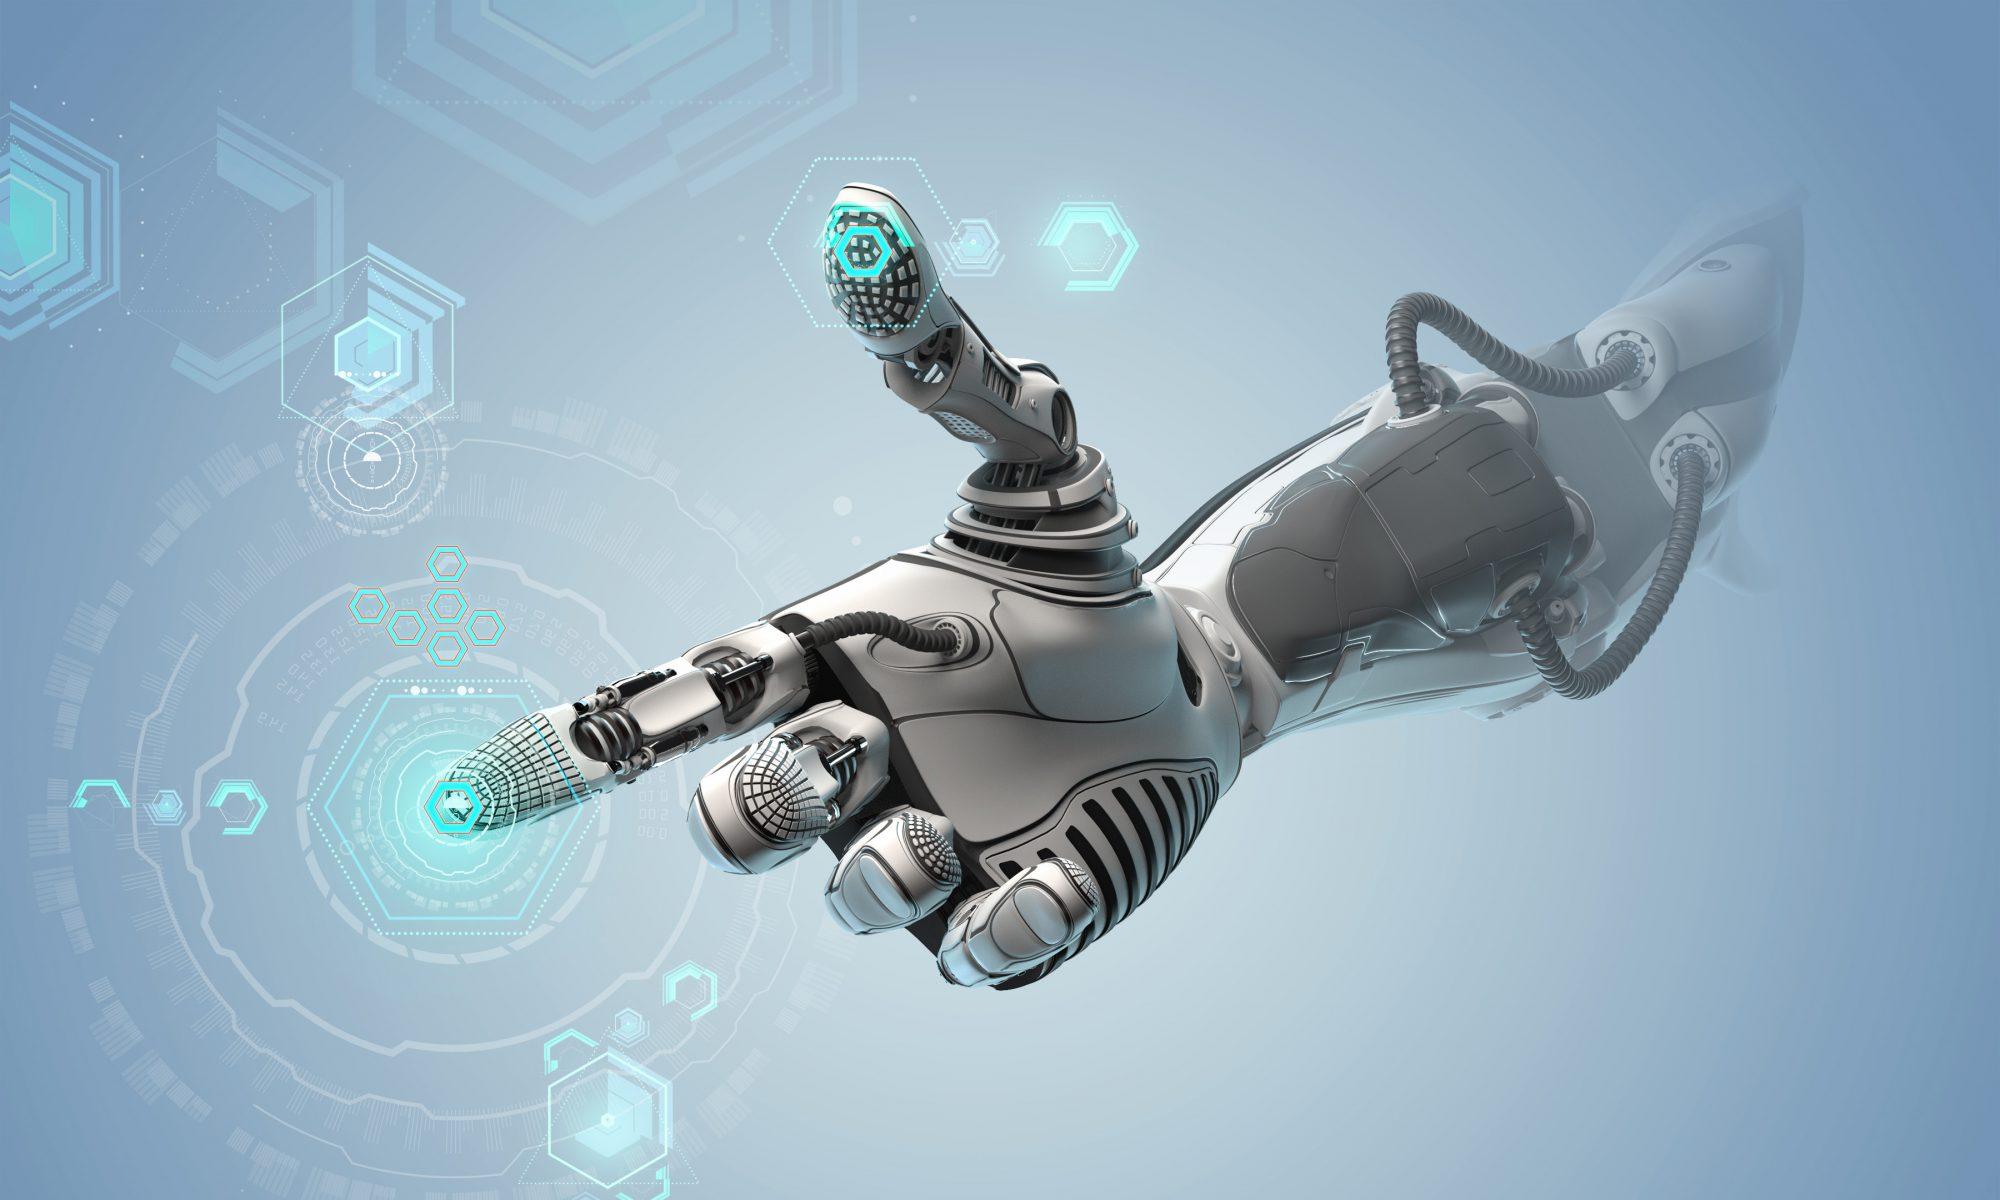 RoboTac 2019